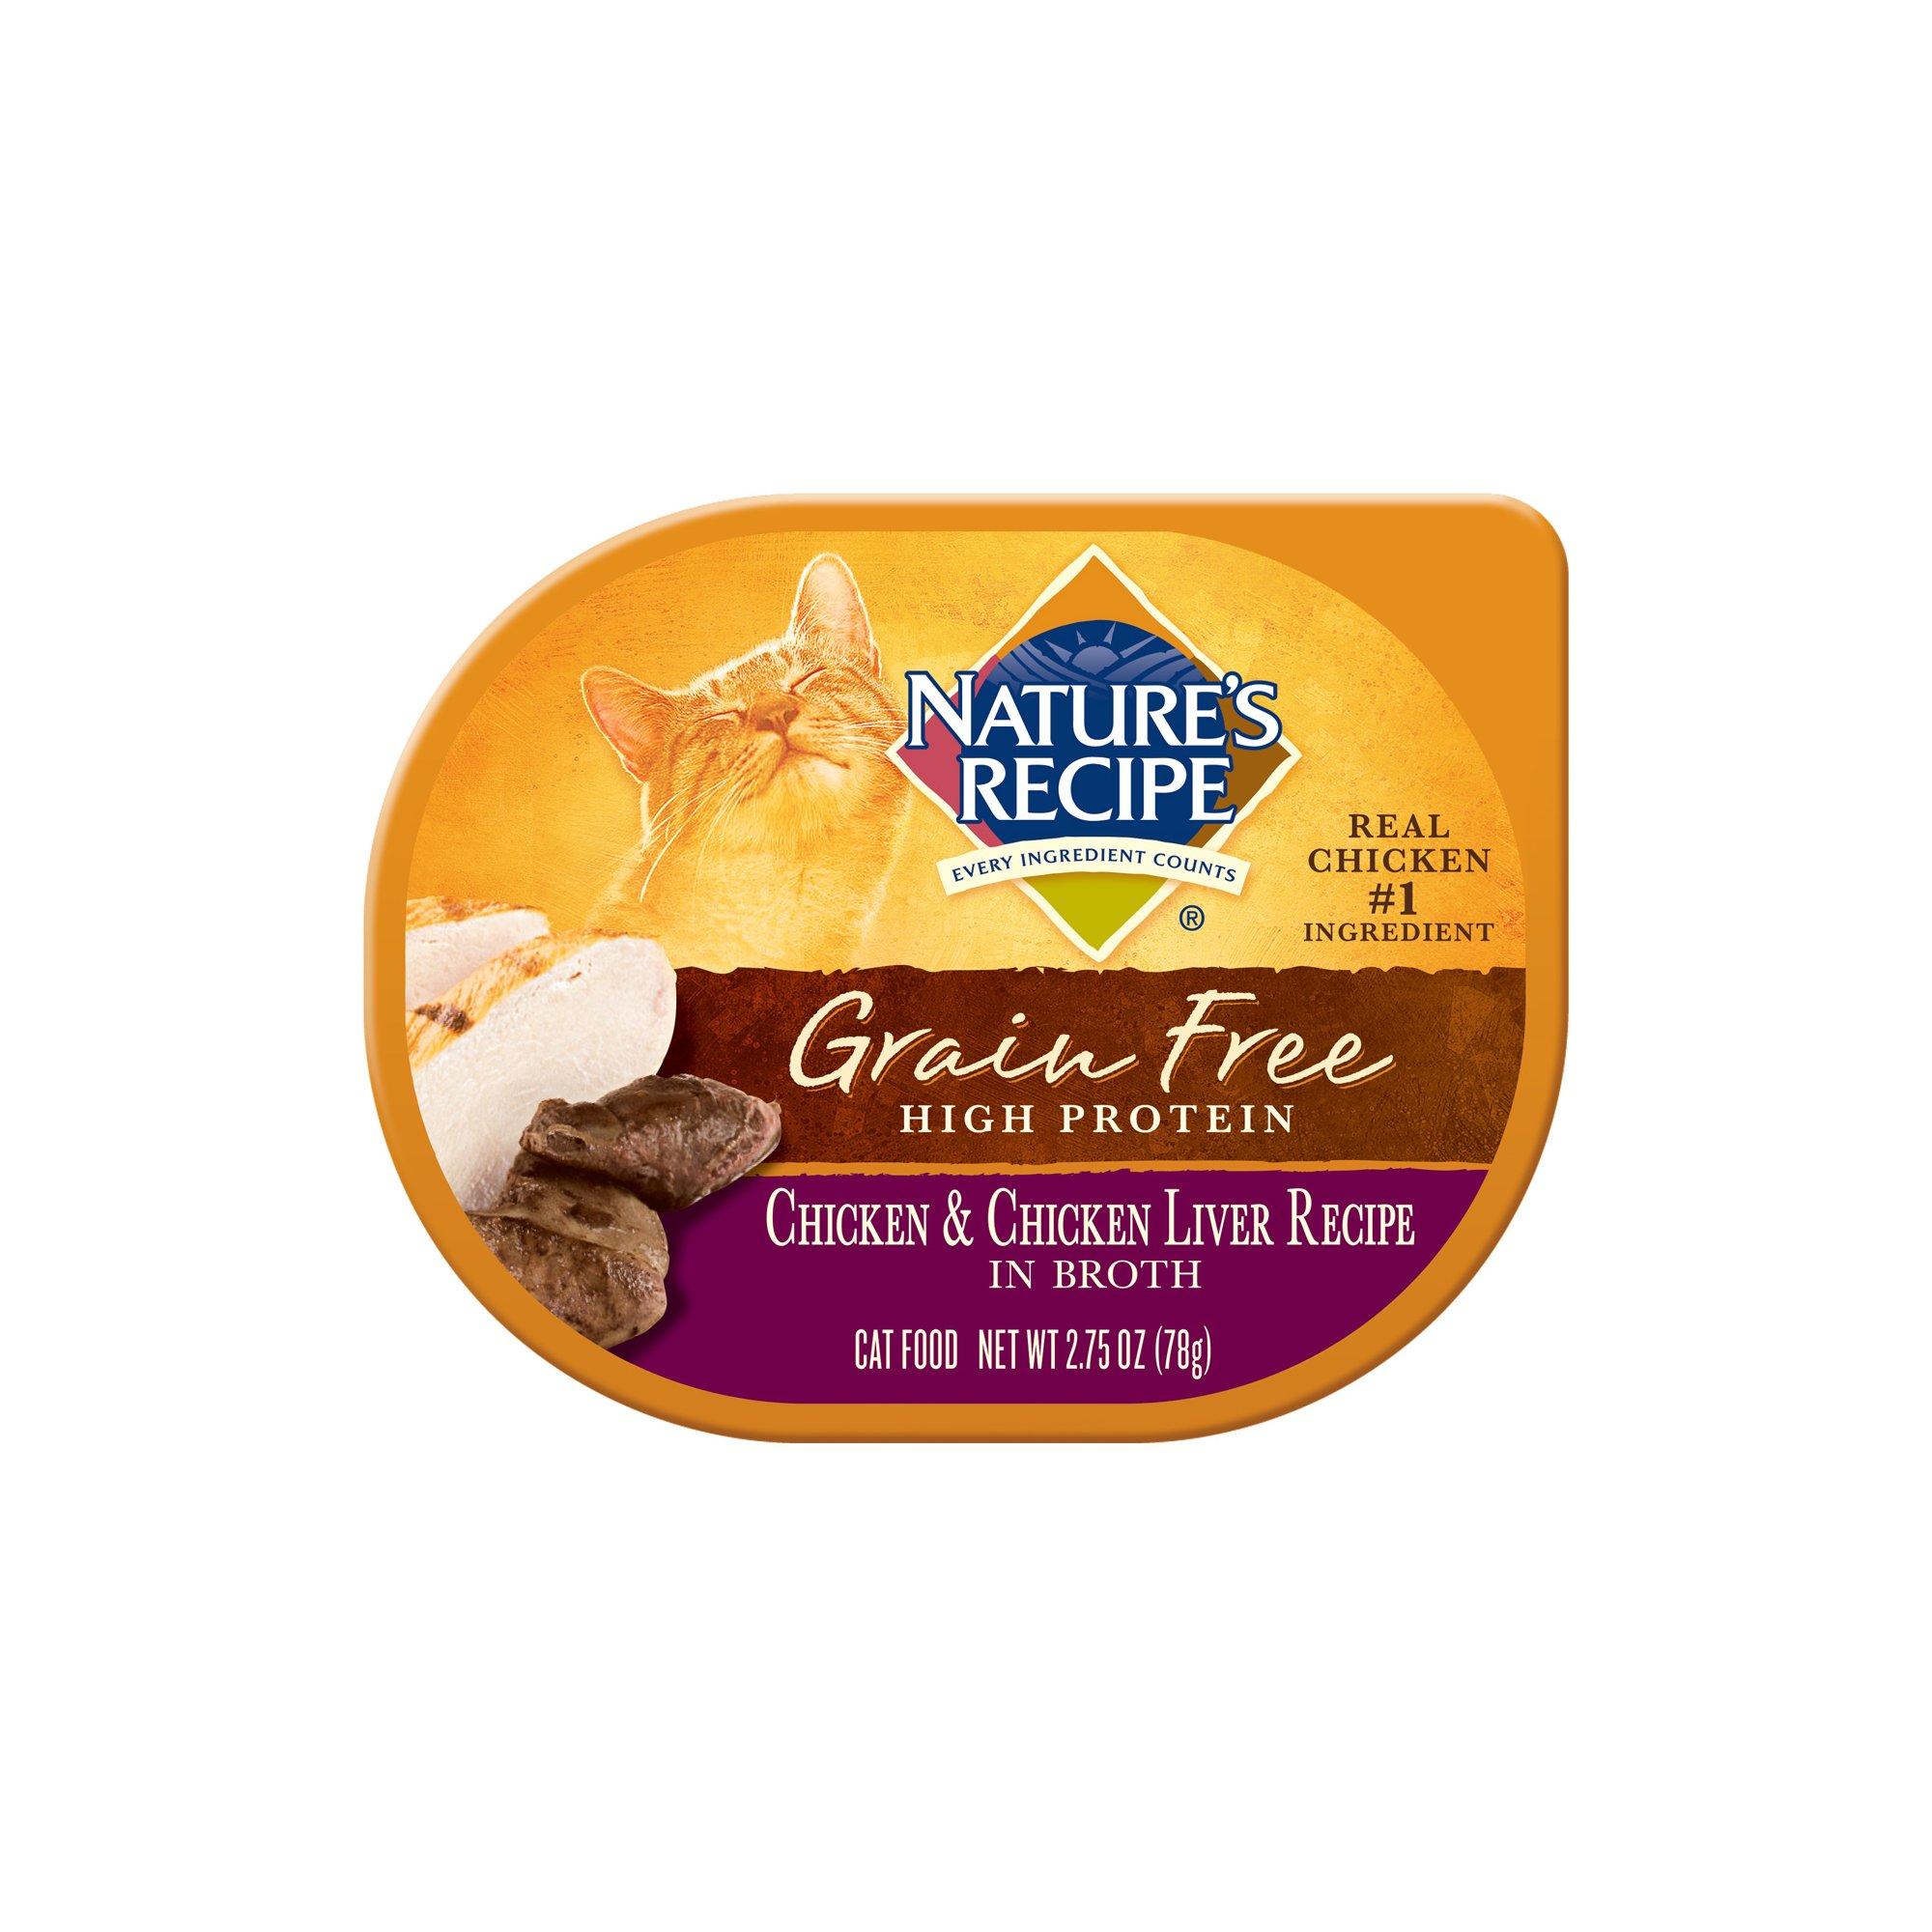 Nature's Recipe Grain Free Chicken & Chicken Liver Recipe in Broth Wet Cat Food